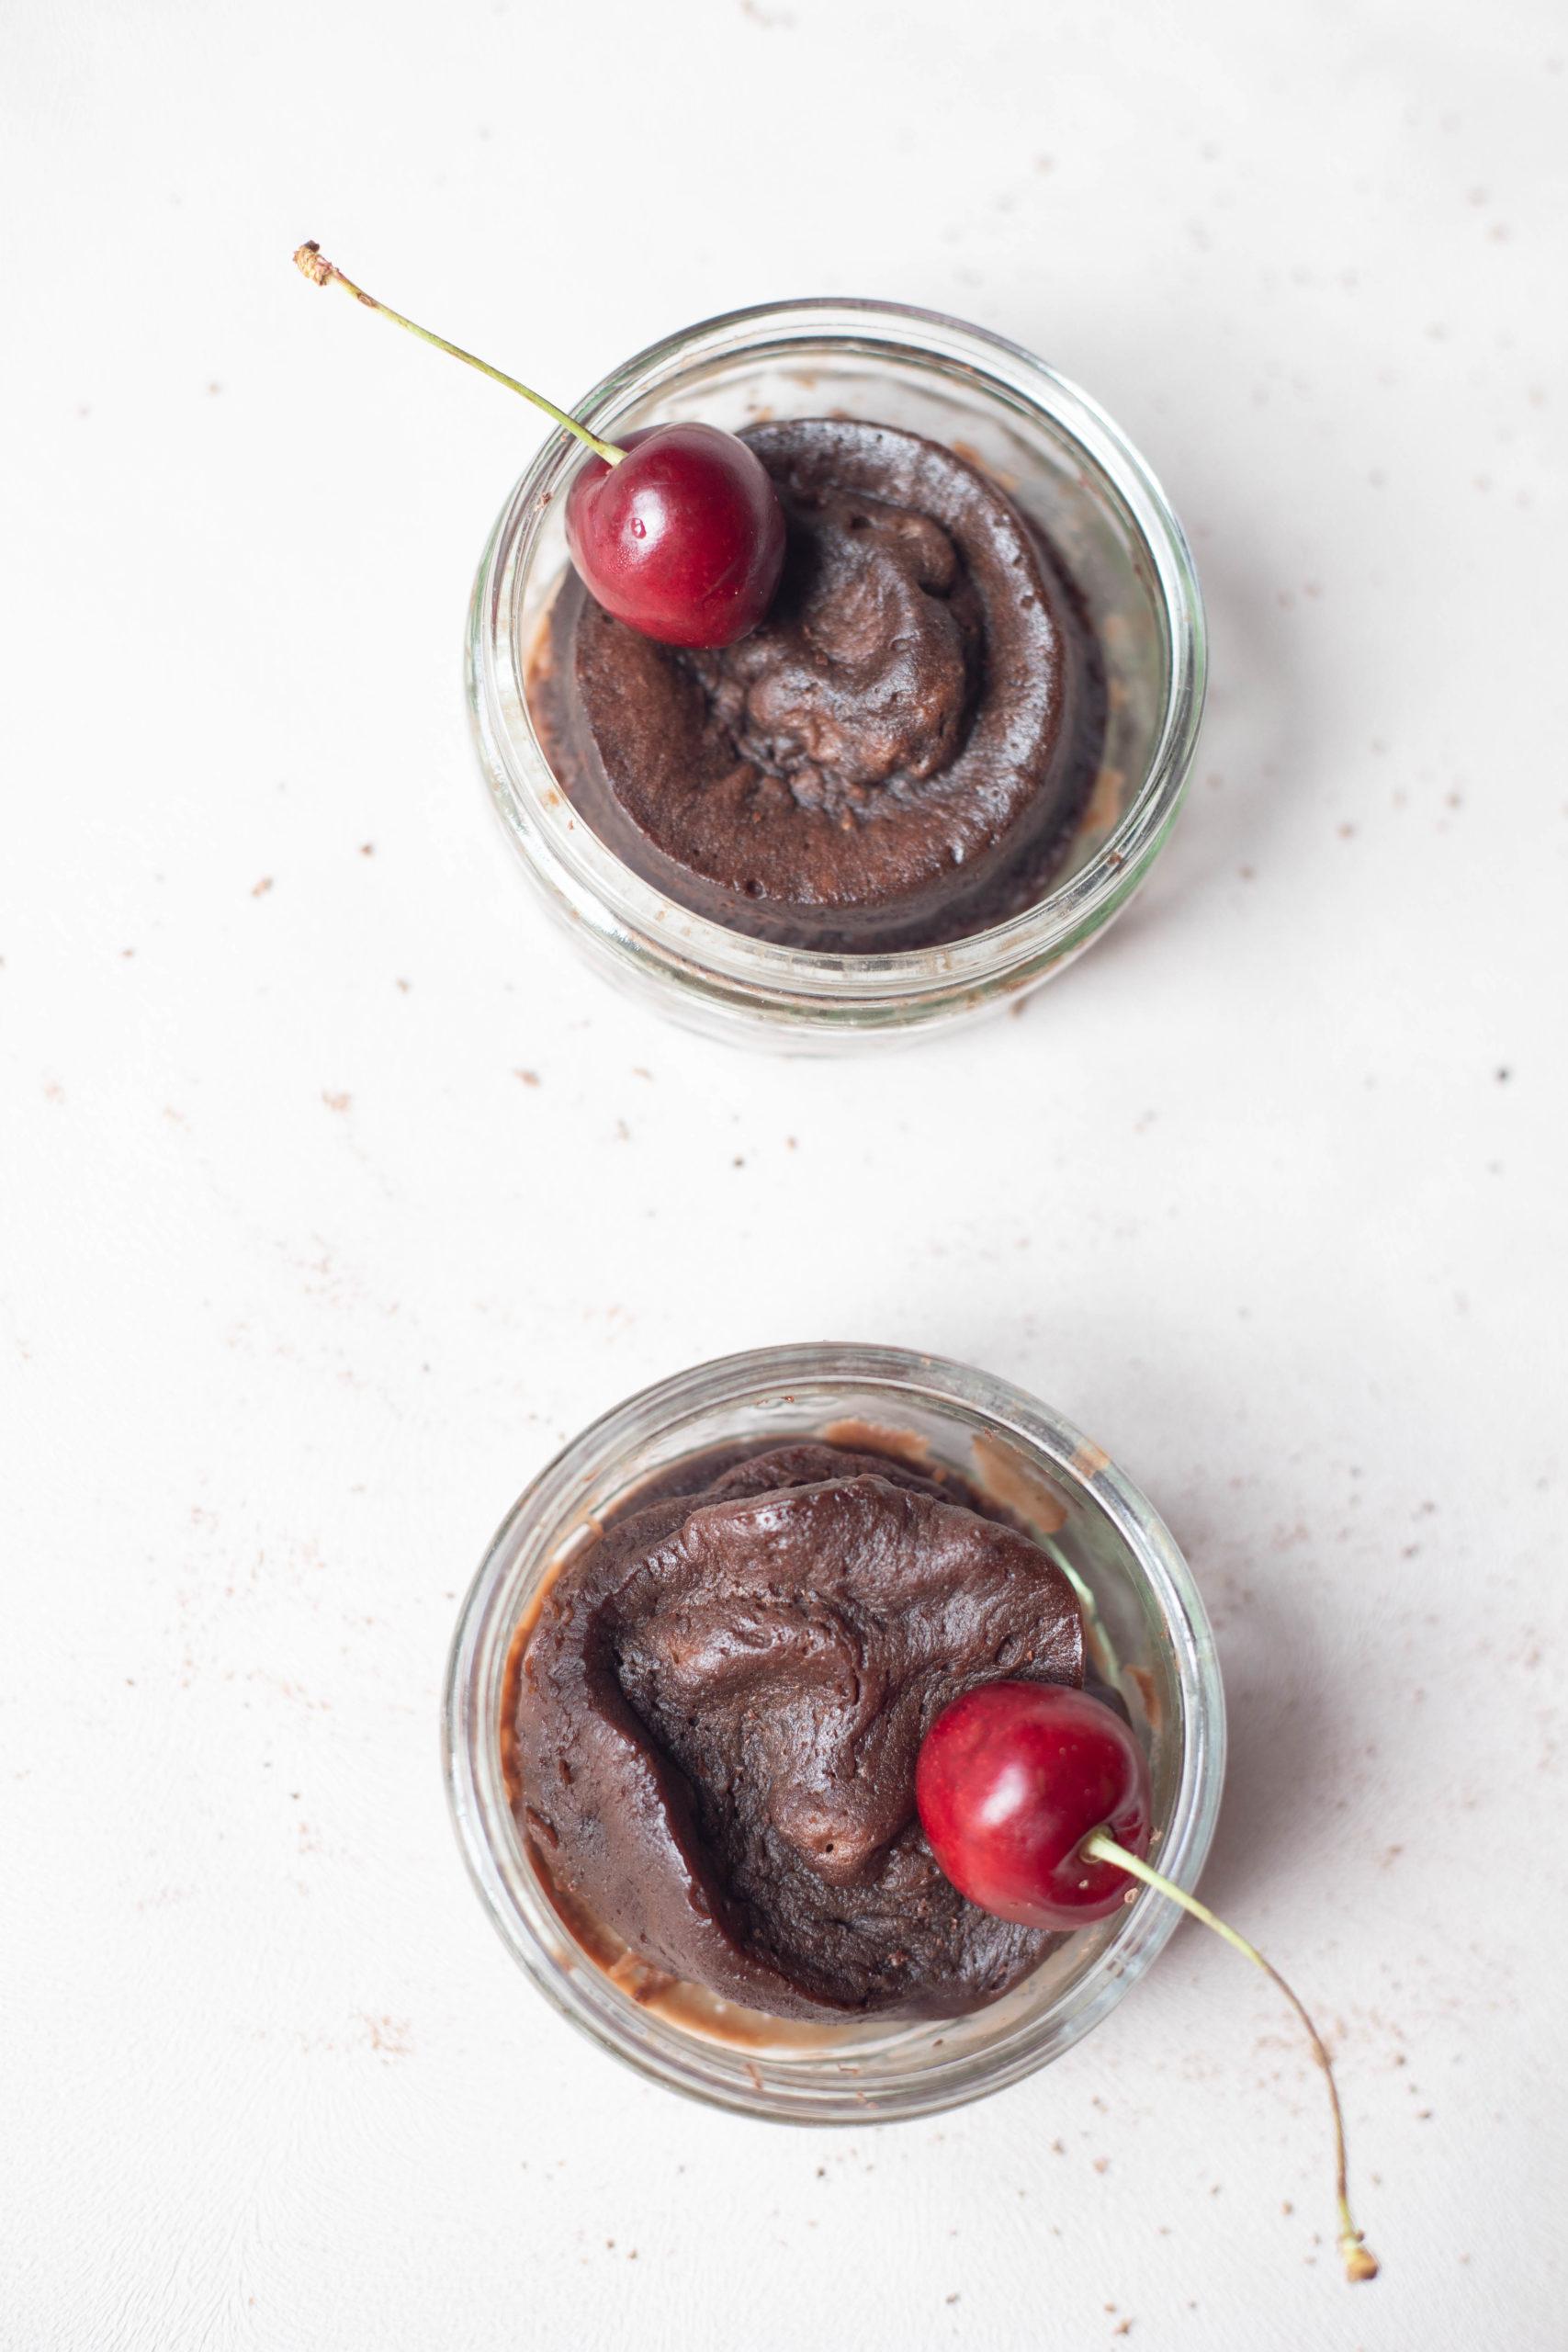 2 chocolate mug cakes with cherries on top